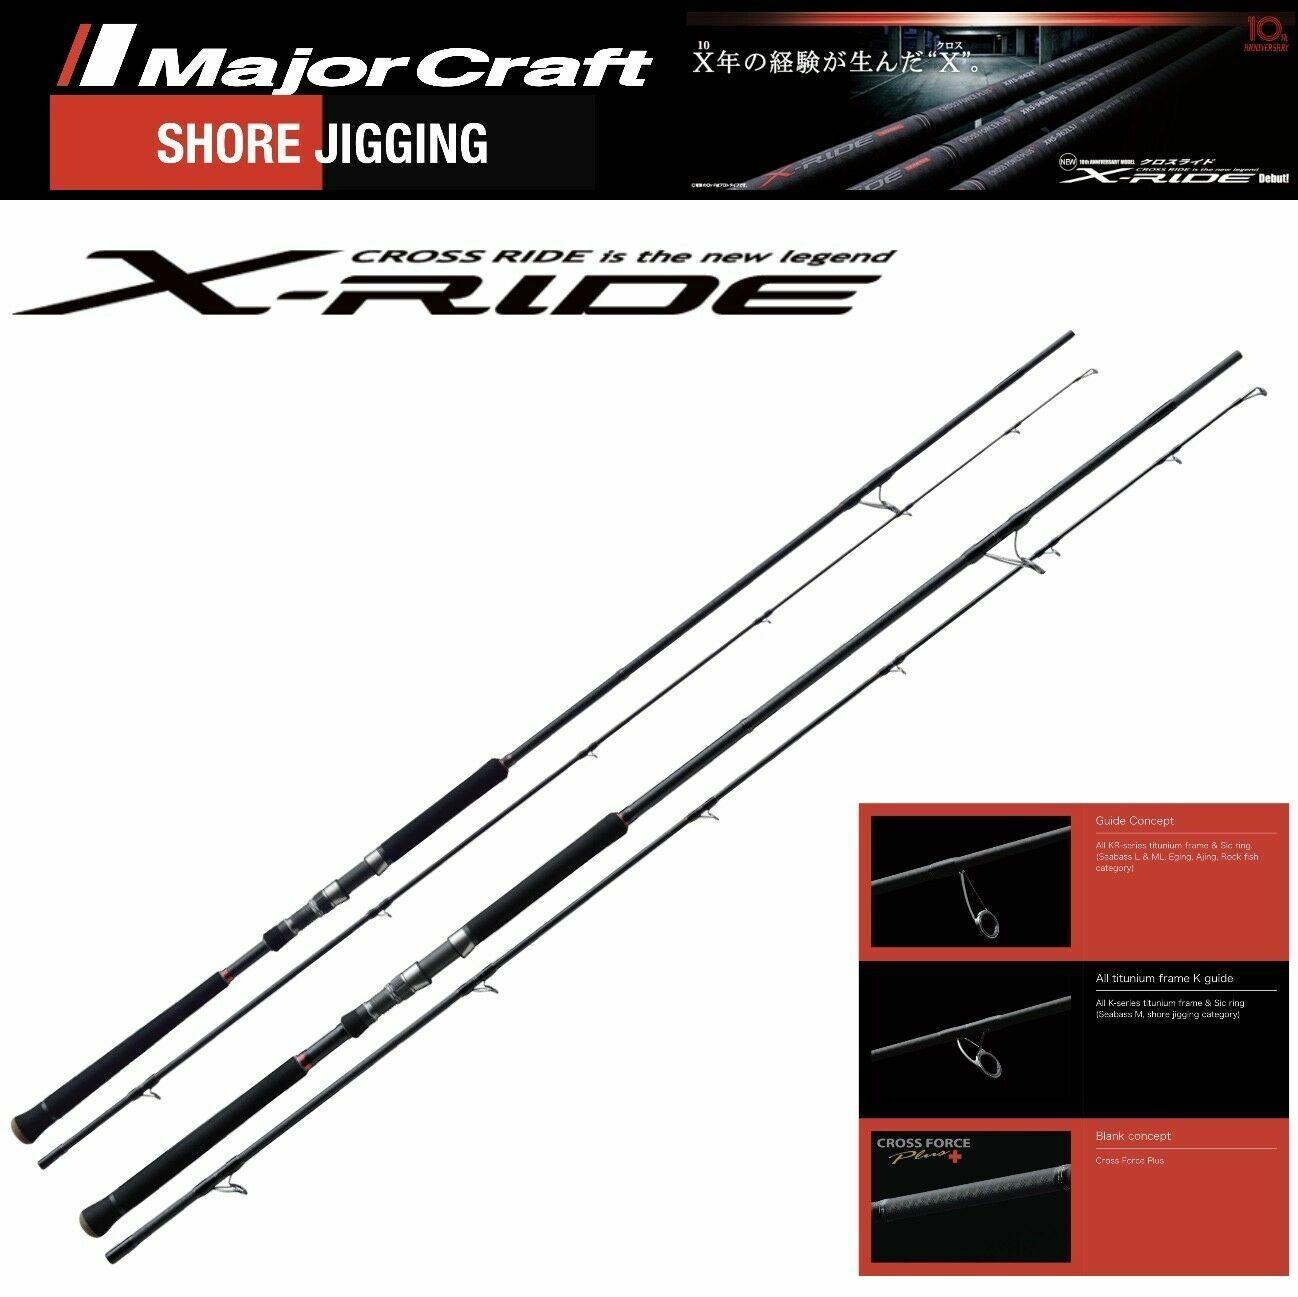 Major Craft Premium Shore Jigging Varilla Modelo X-Ride